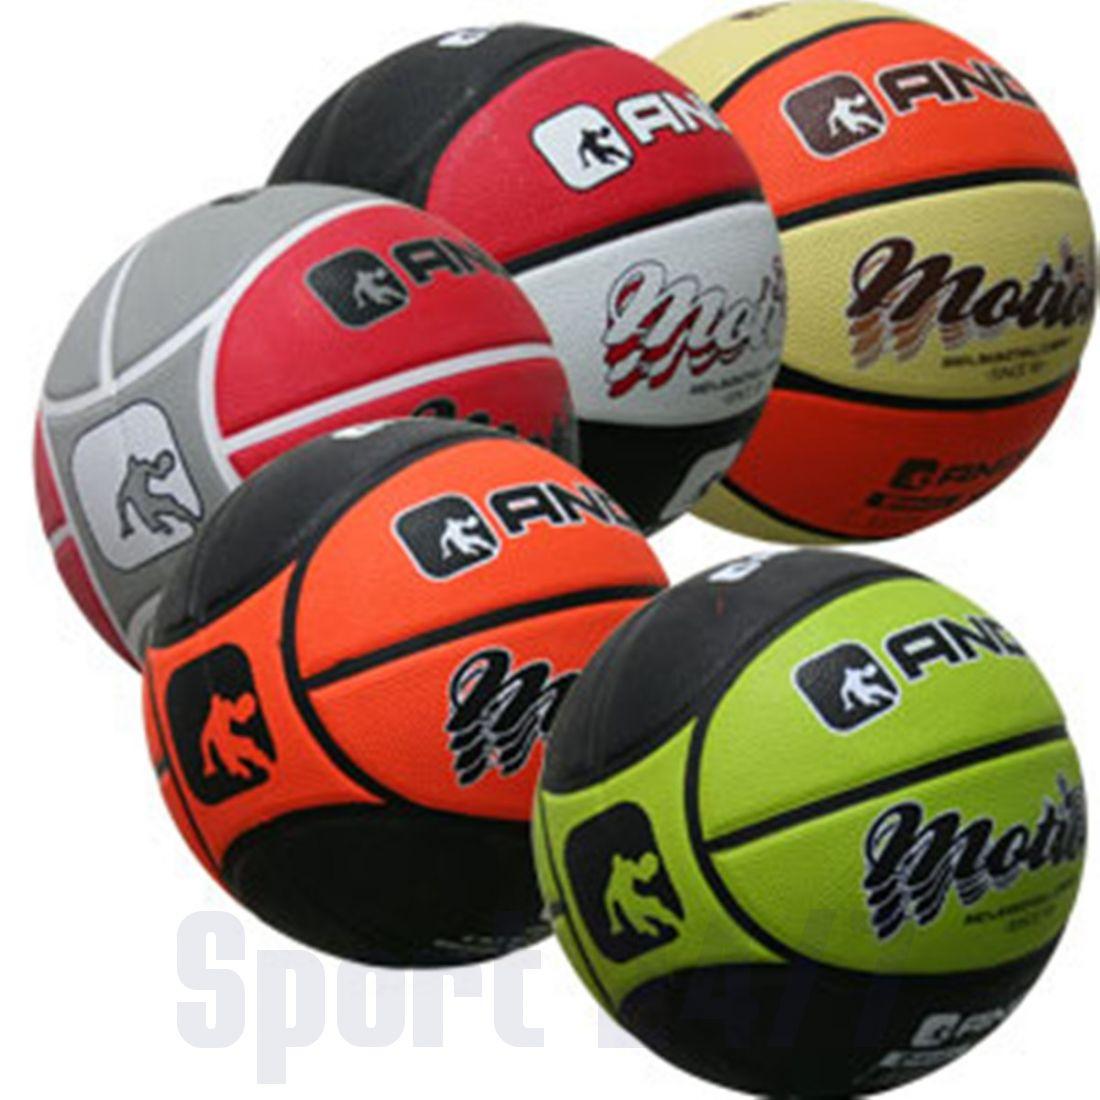 Баскетбольный мяч AND1 Motion Orange/Cream